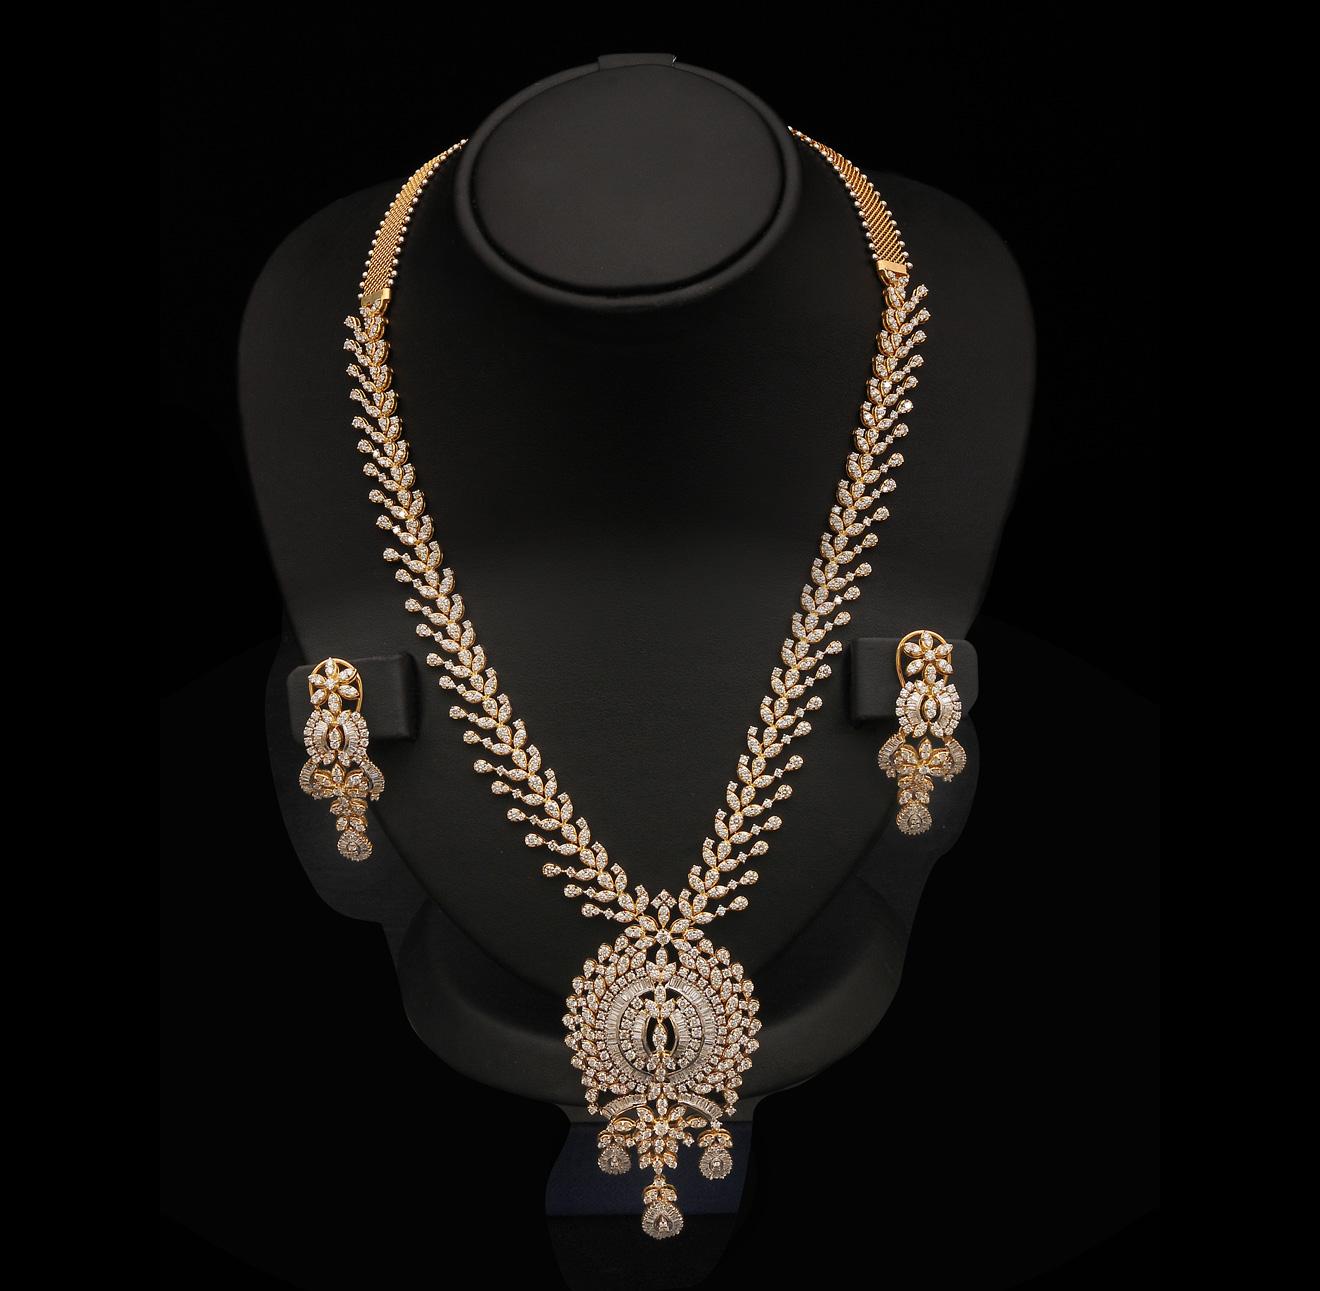 Gold And Diamond Jewellery Designs: Indian Diamond Bridal